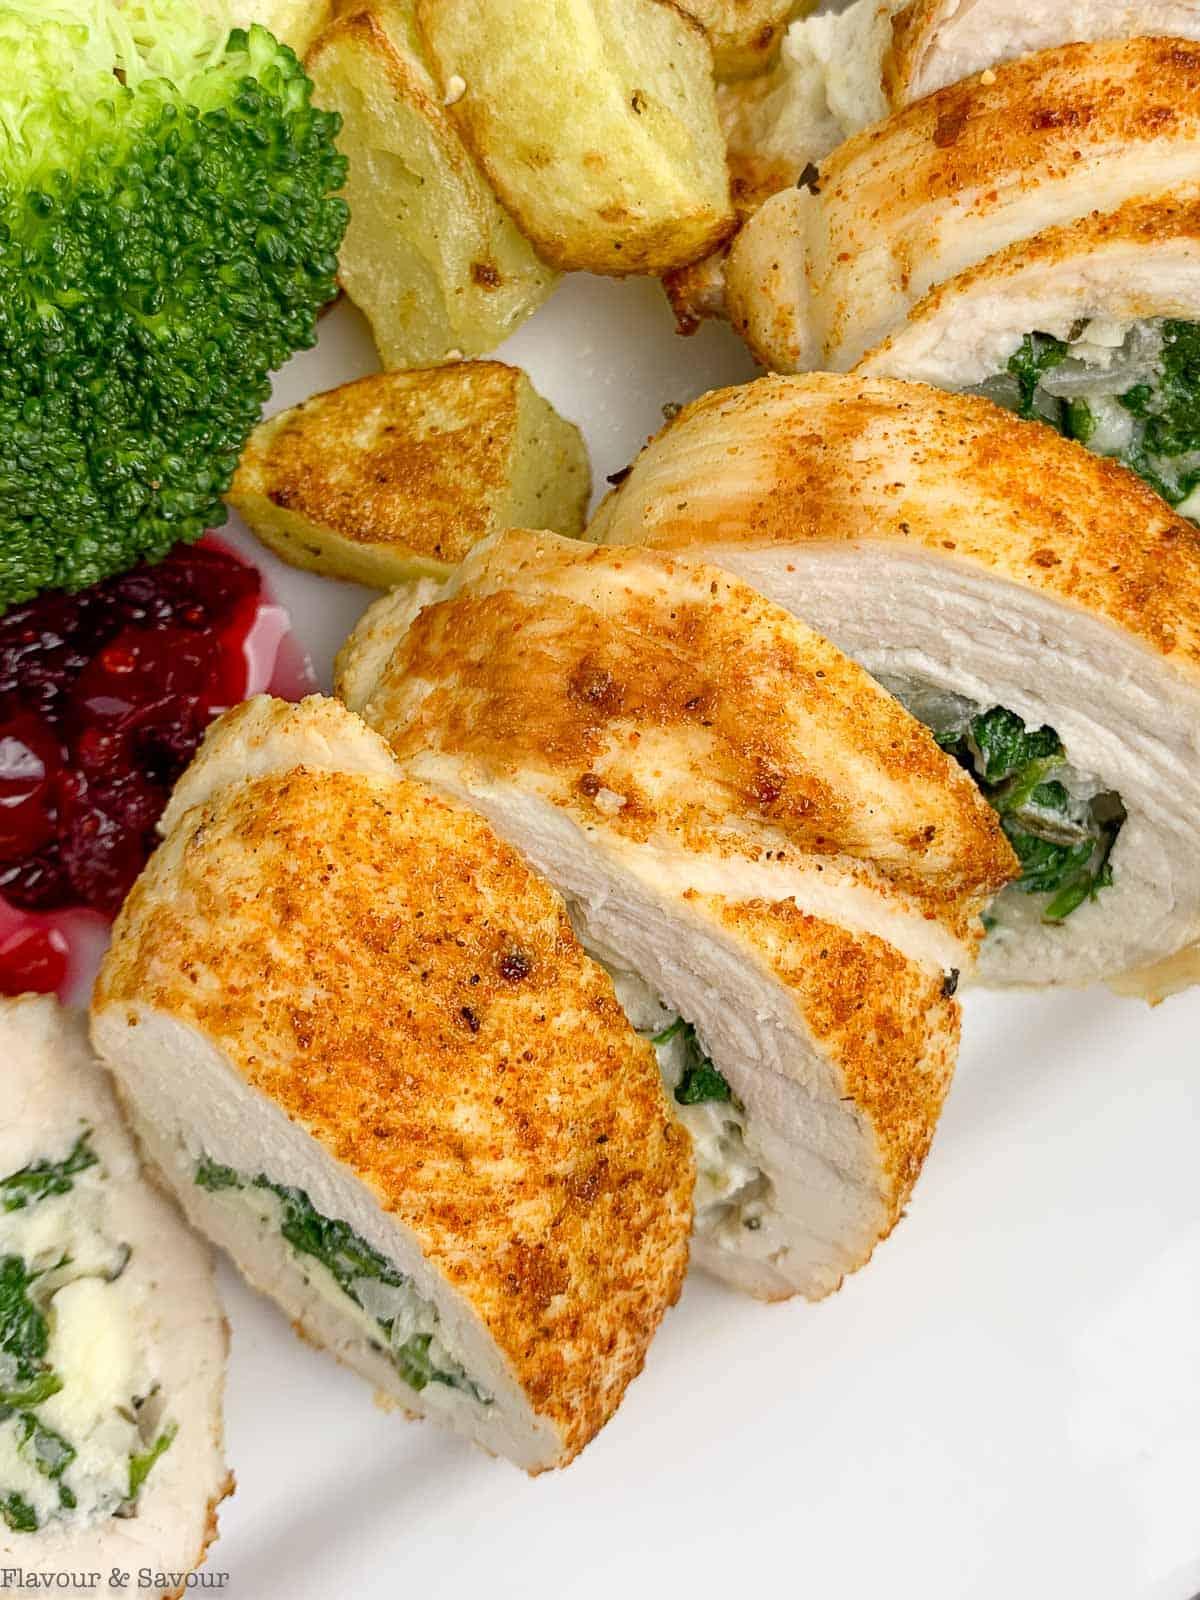 Rolled Stuffed Turkey Breast with broccoli